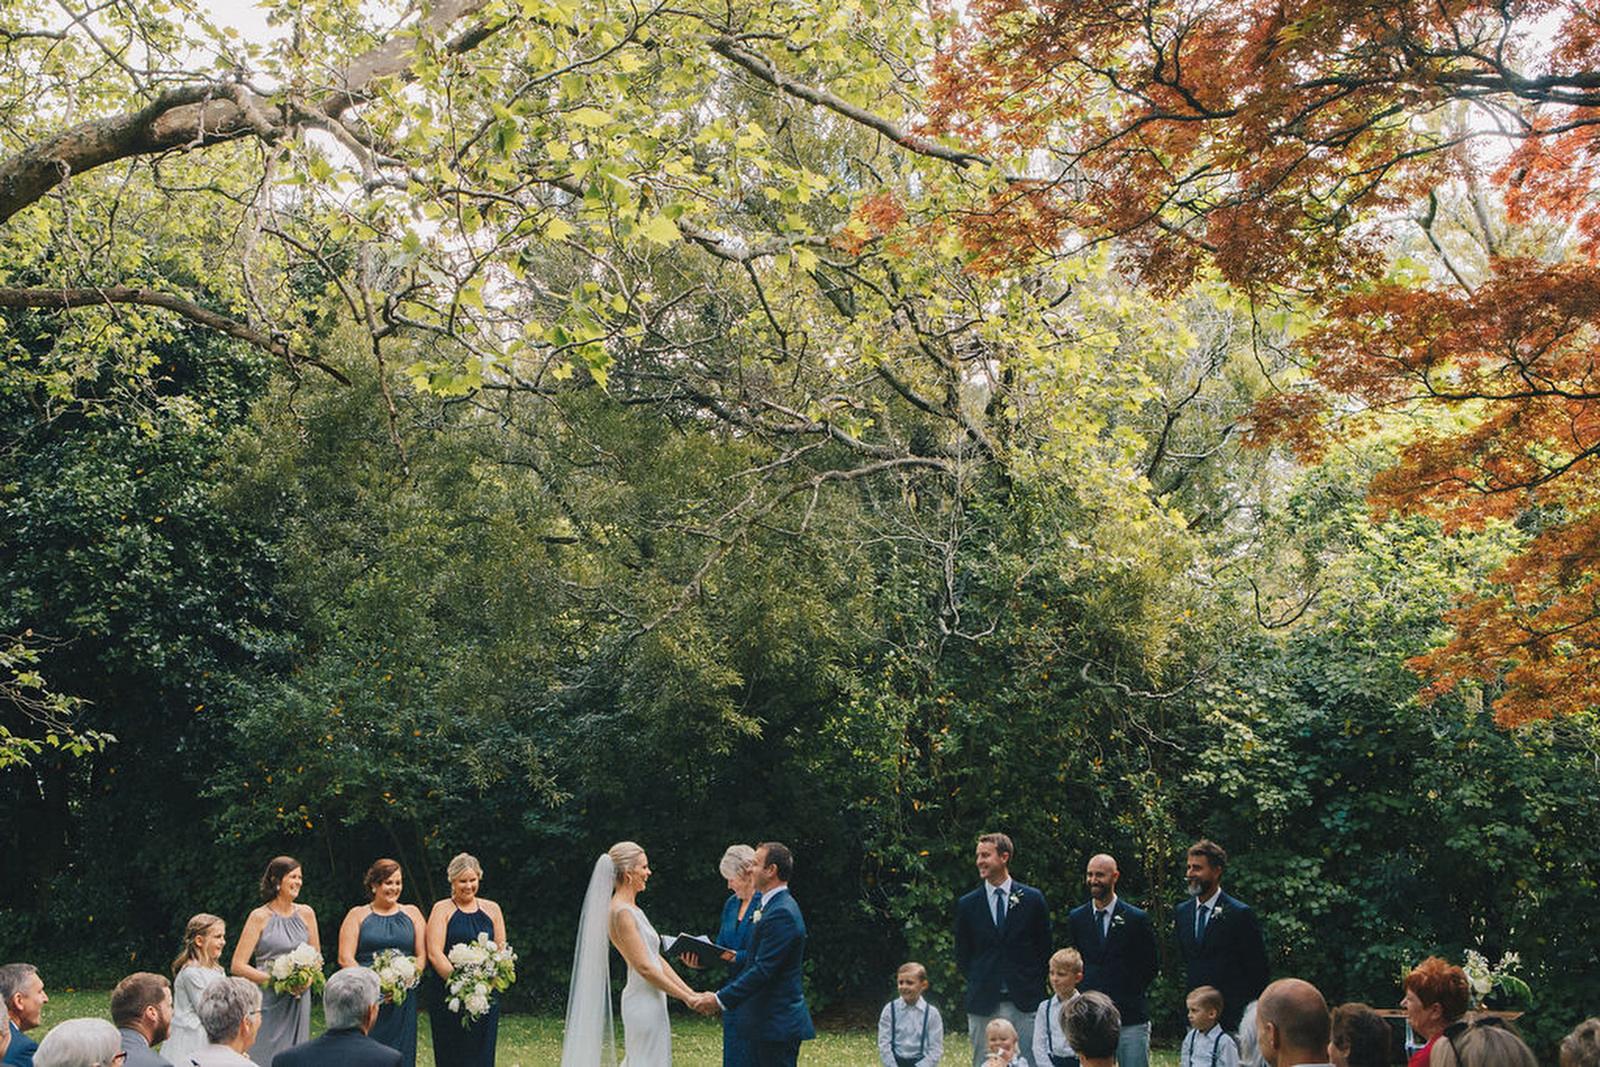 wedding-venue-Rose&Smith-29.JPG